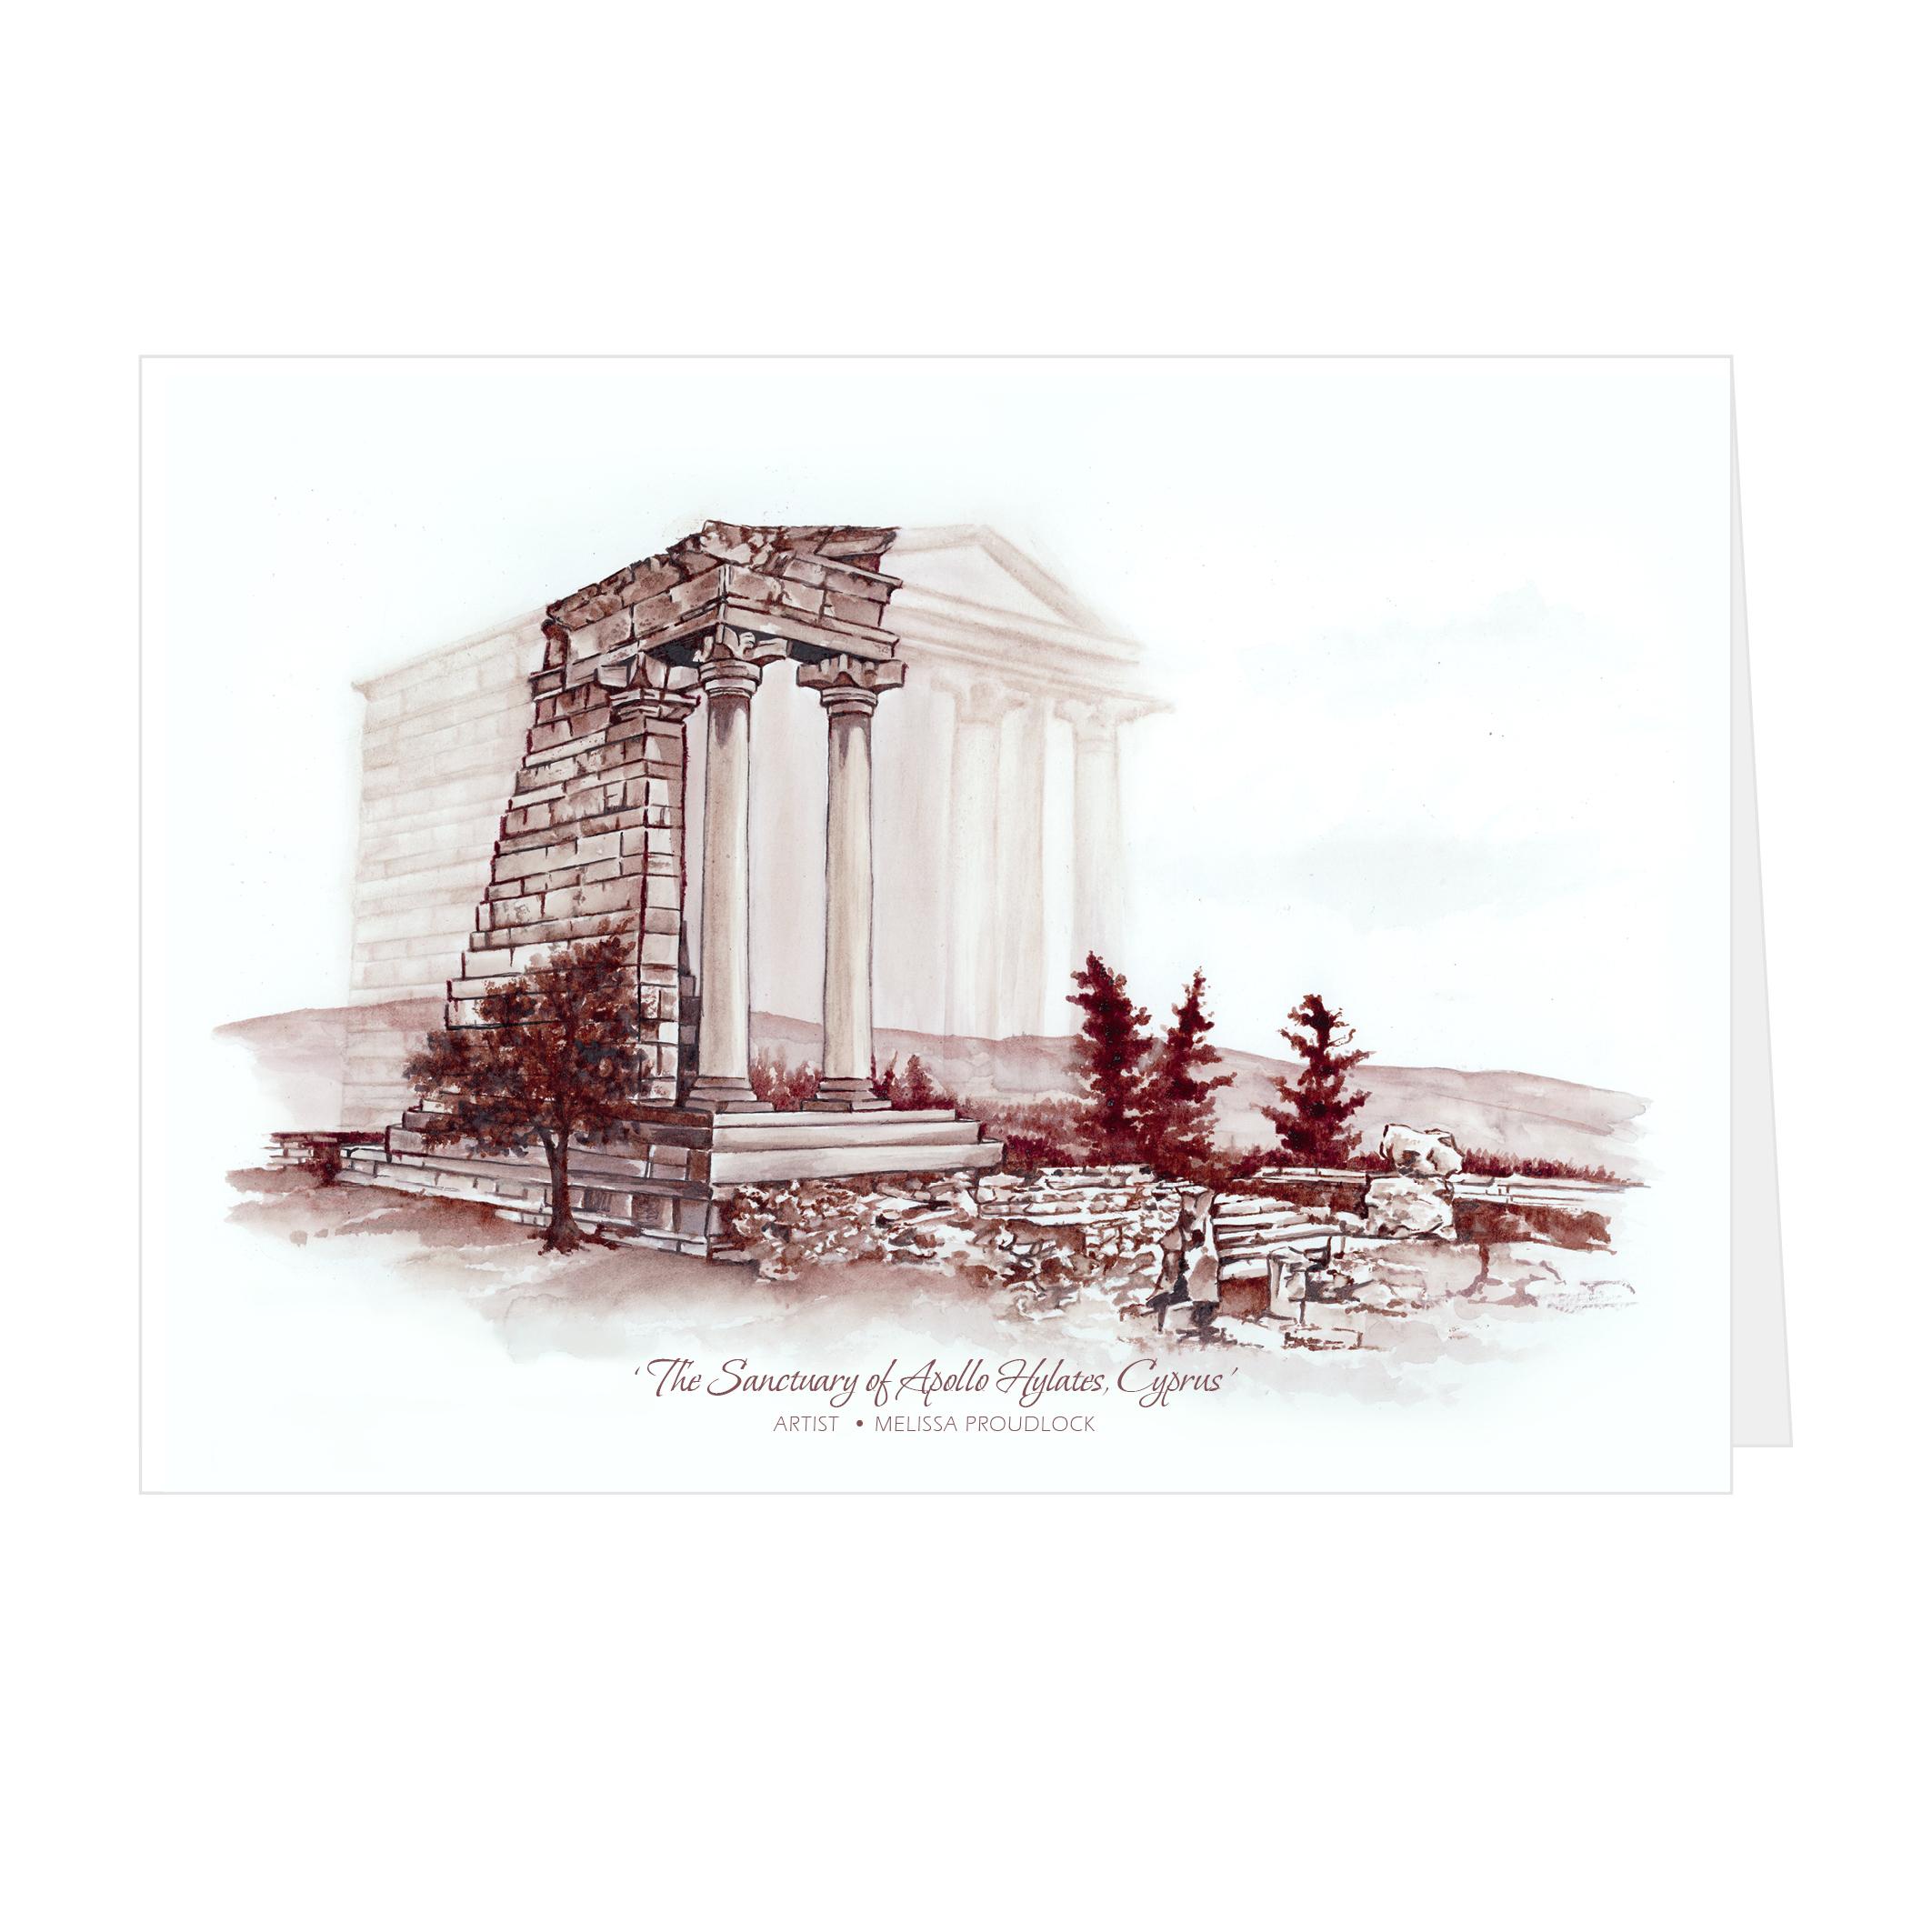 Temple of Apollo, Cyprus